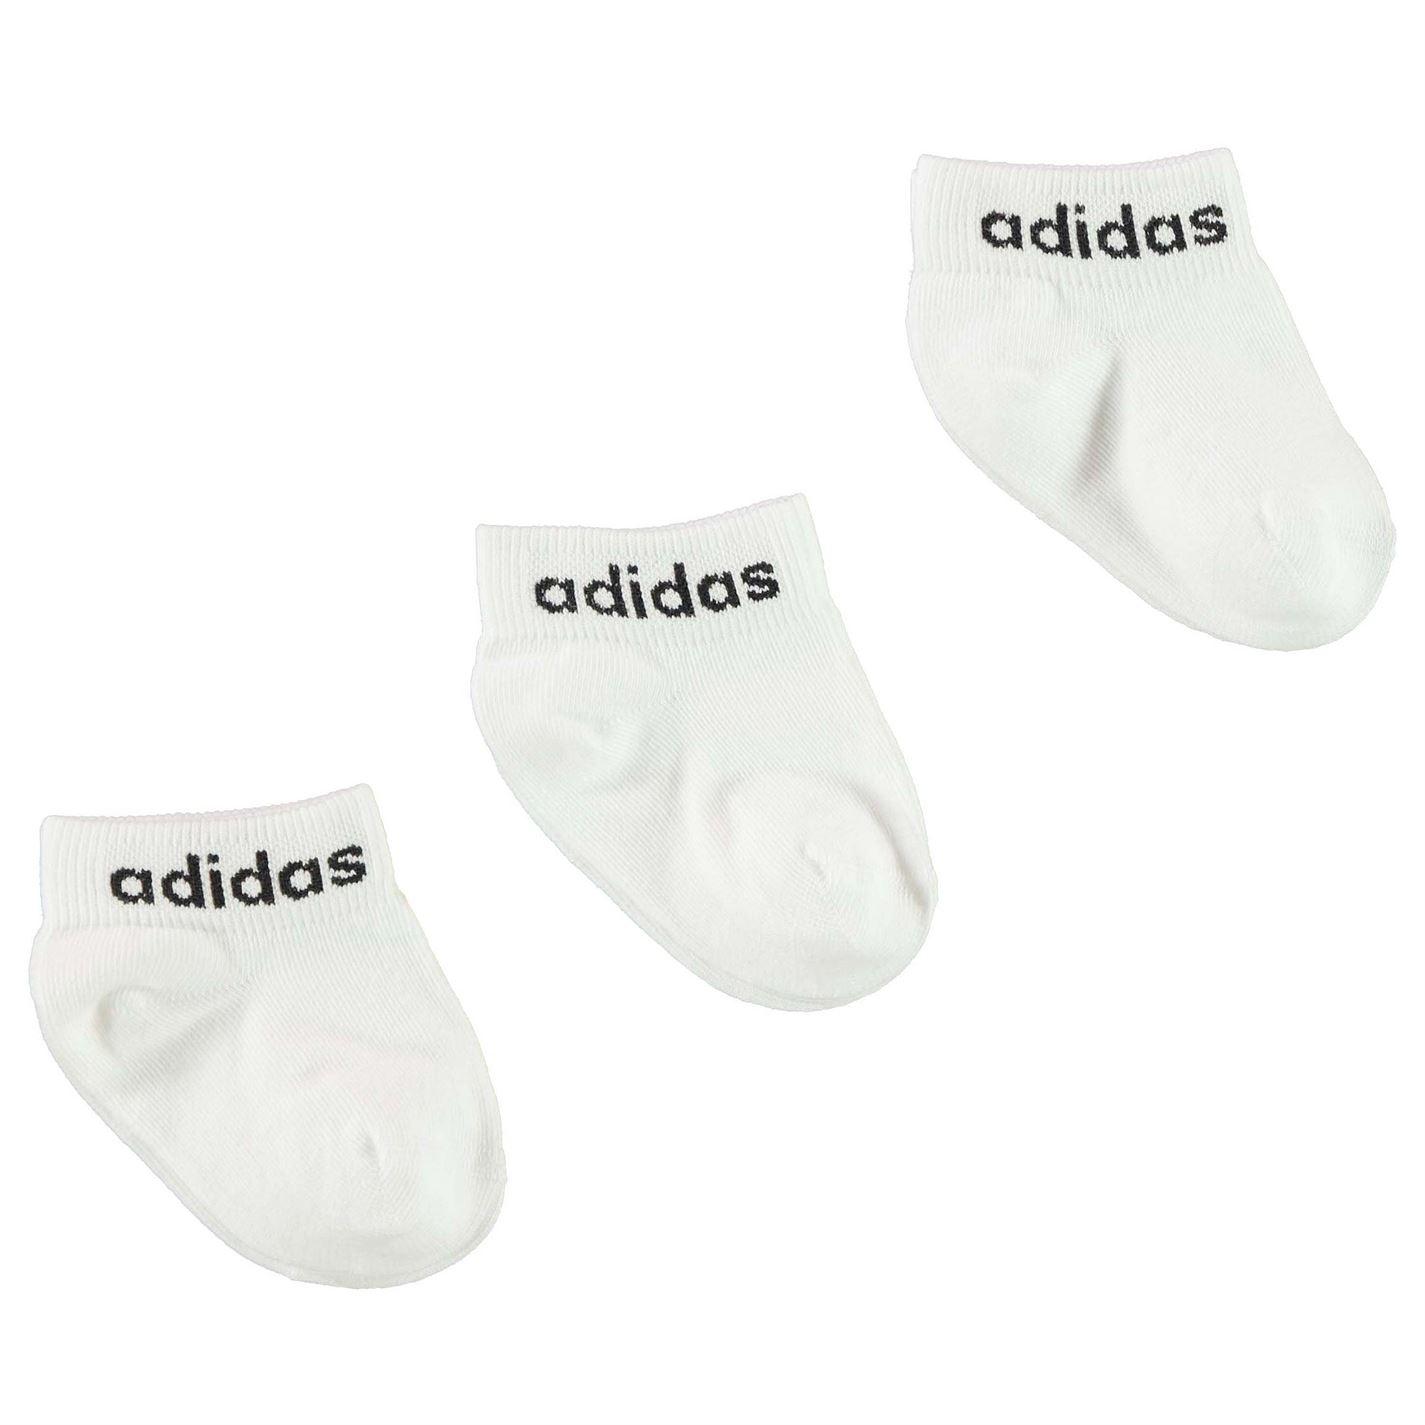 Adidas 3 Pack Ankle Socks Infants